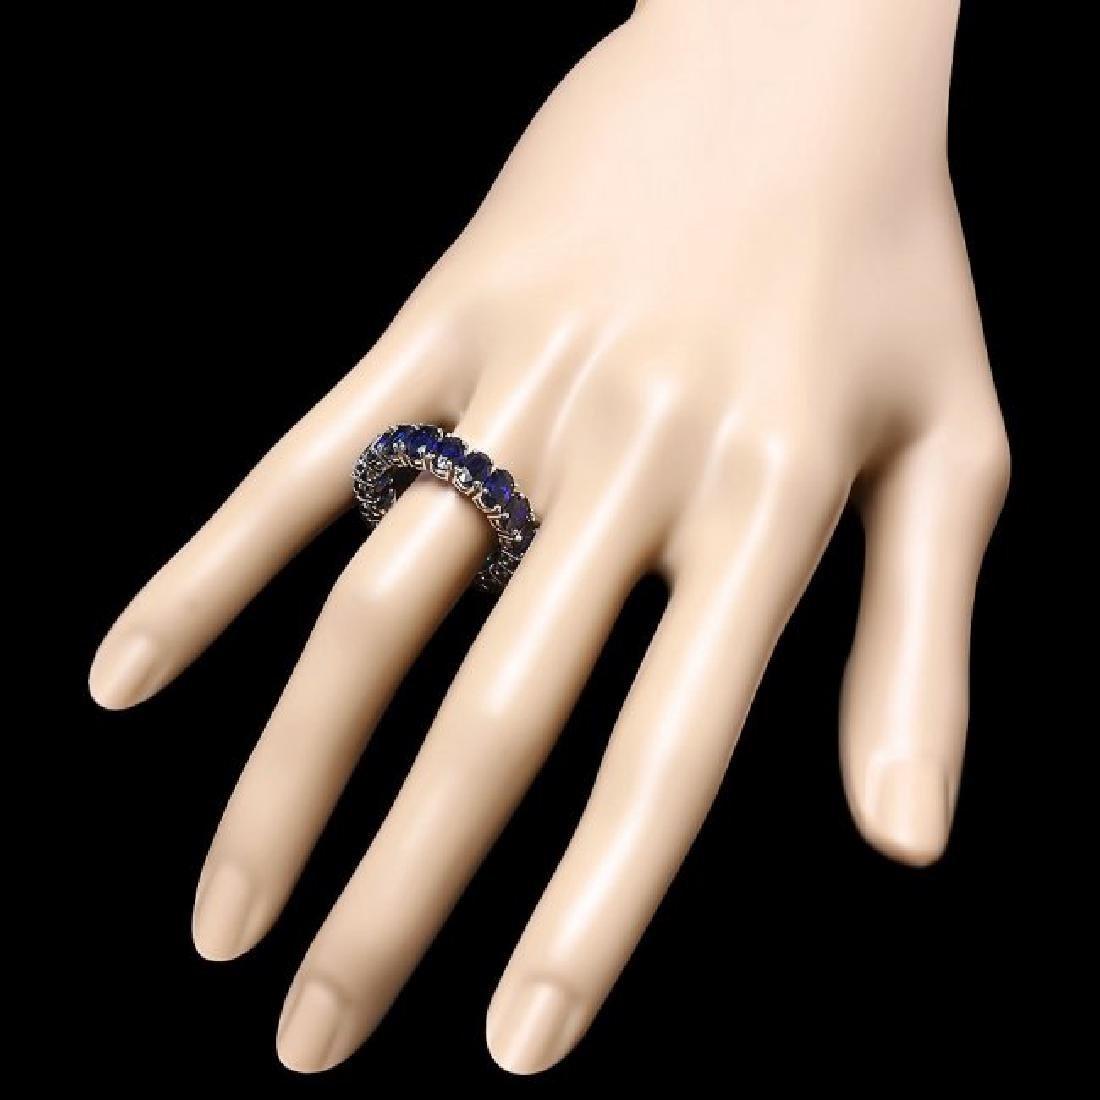 14k White Gold 9.00ct Sapphire Ring - 3